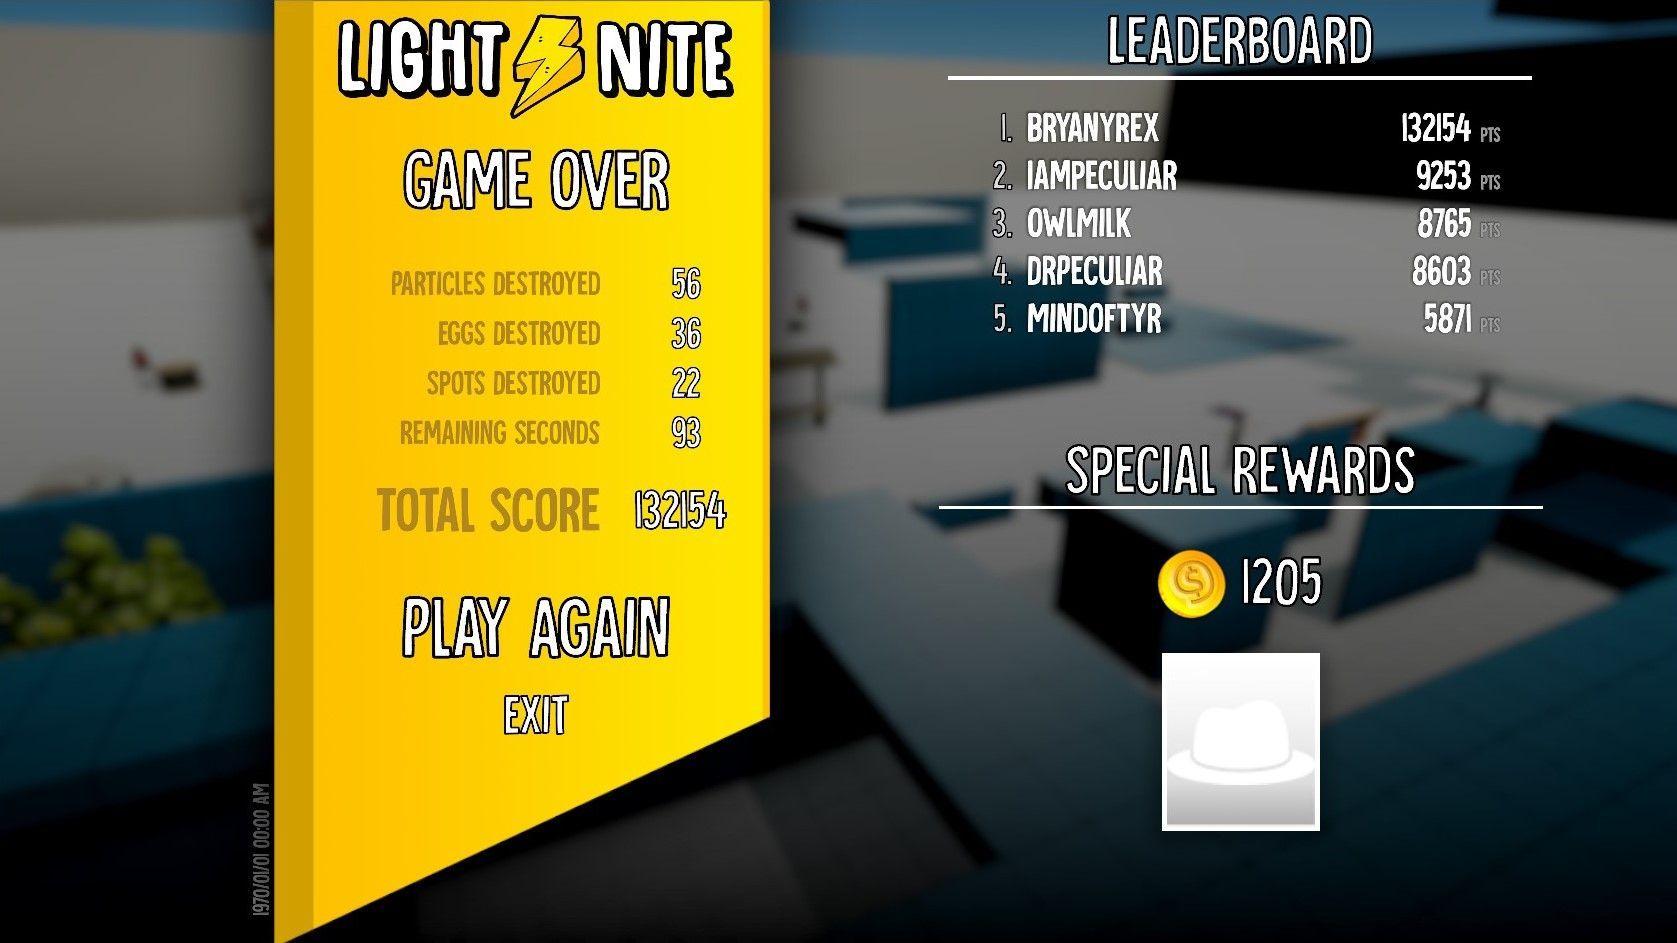 LIGHT⚡NITE GAME - In-Game Leaderboards